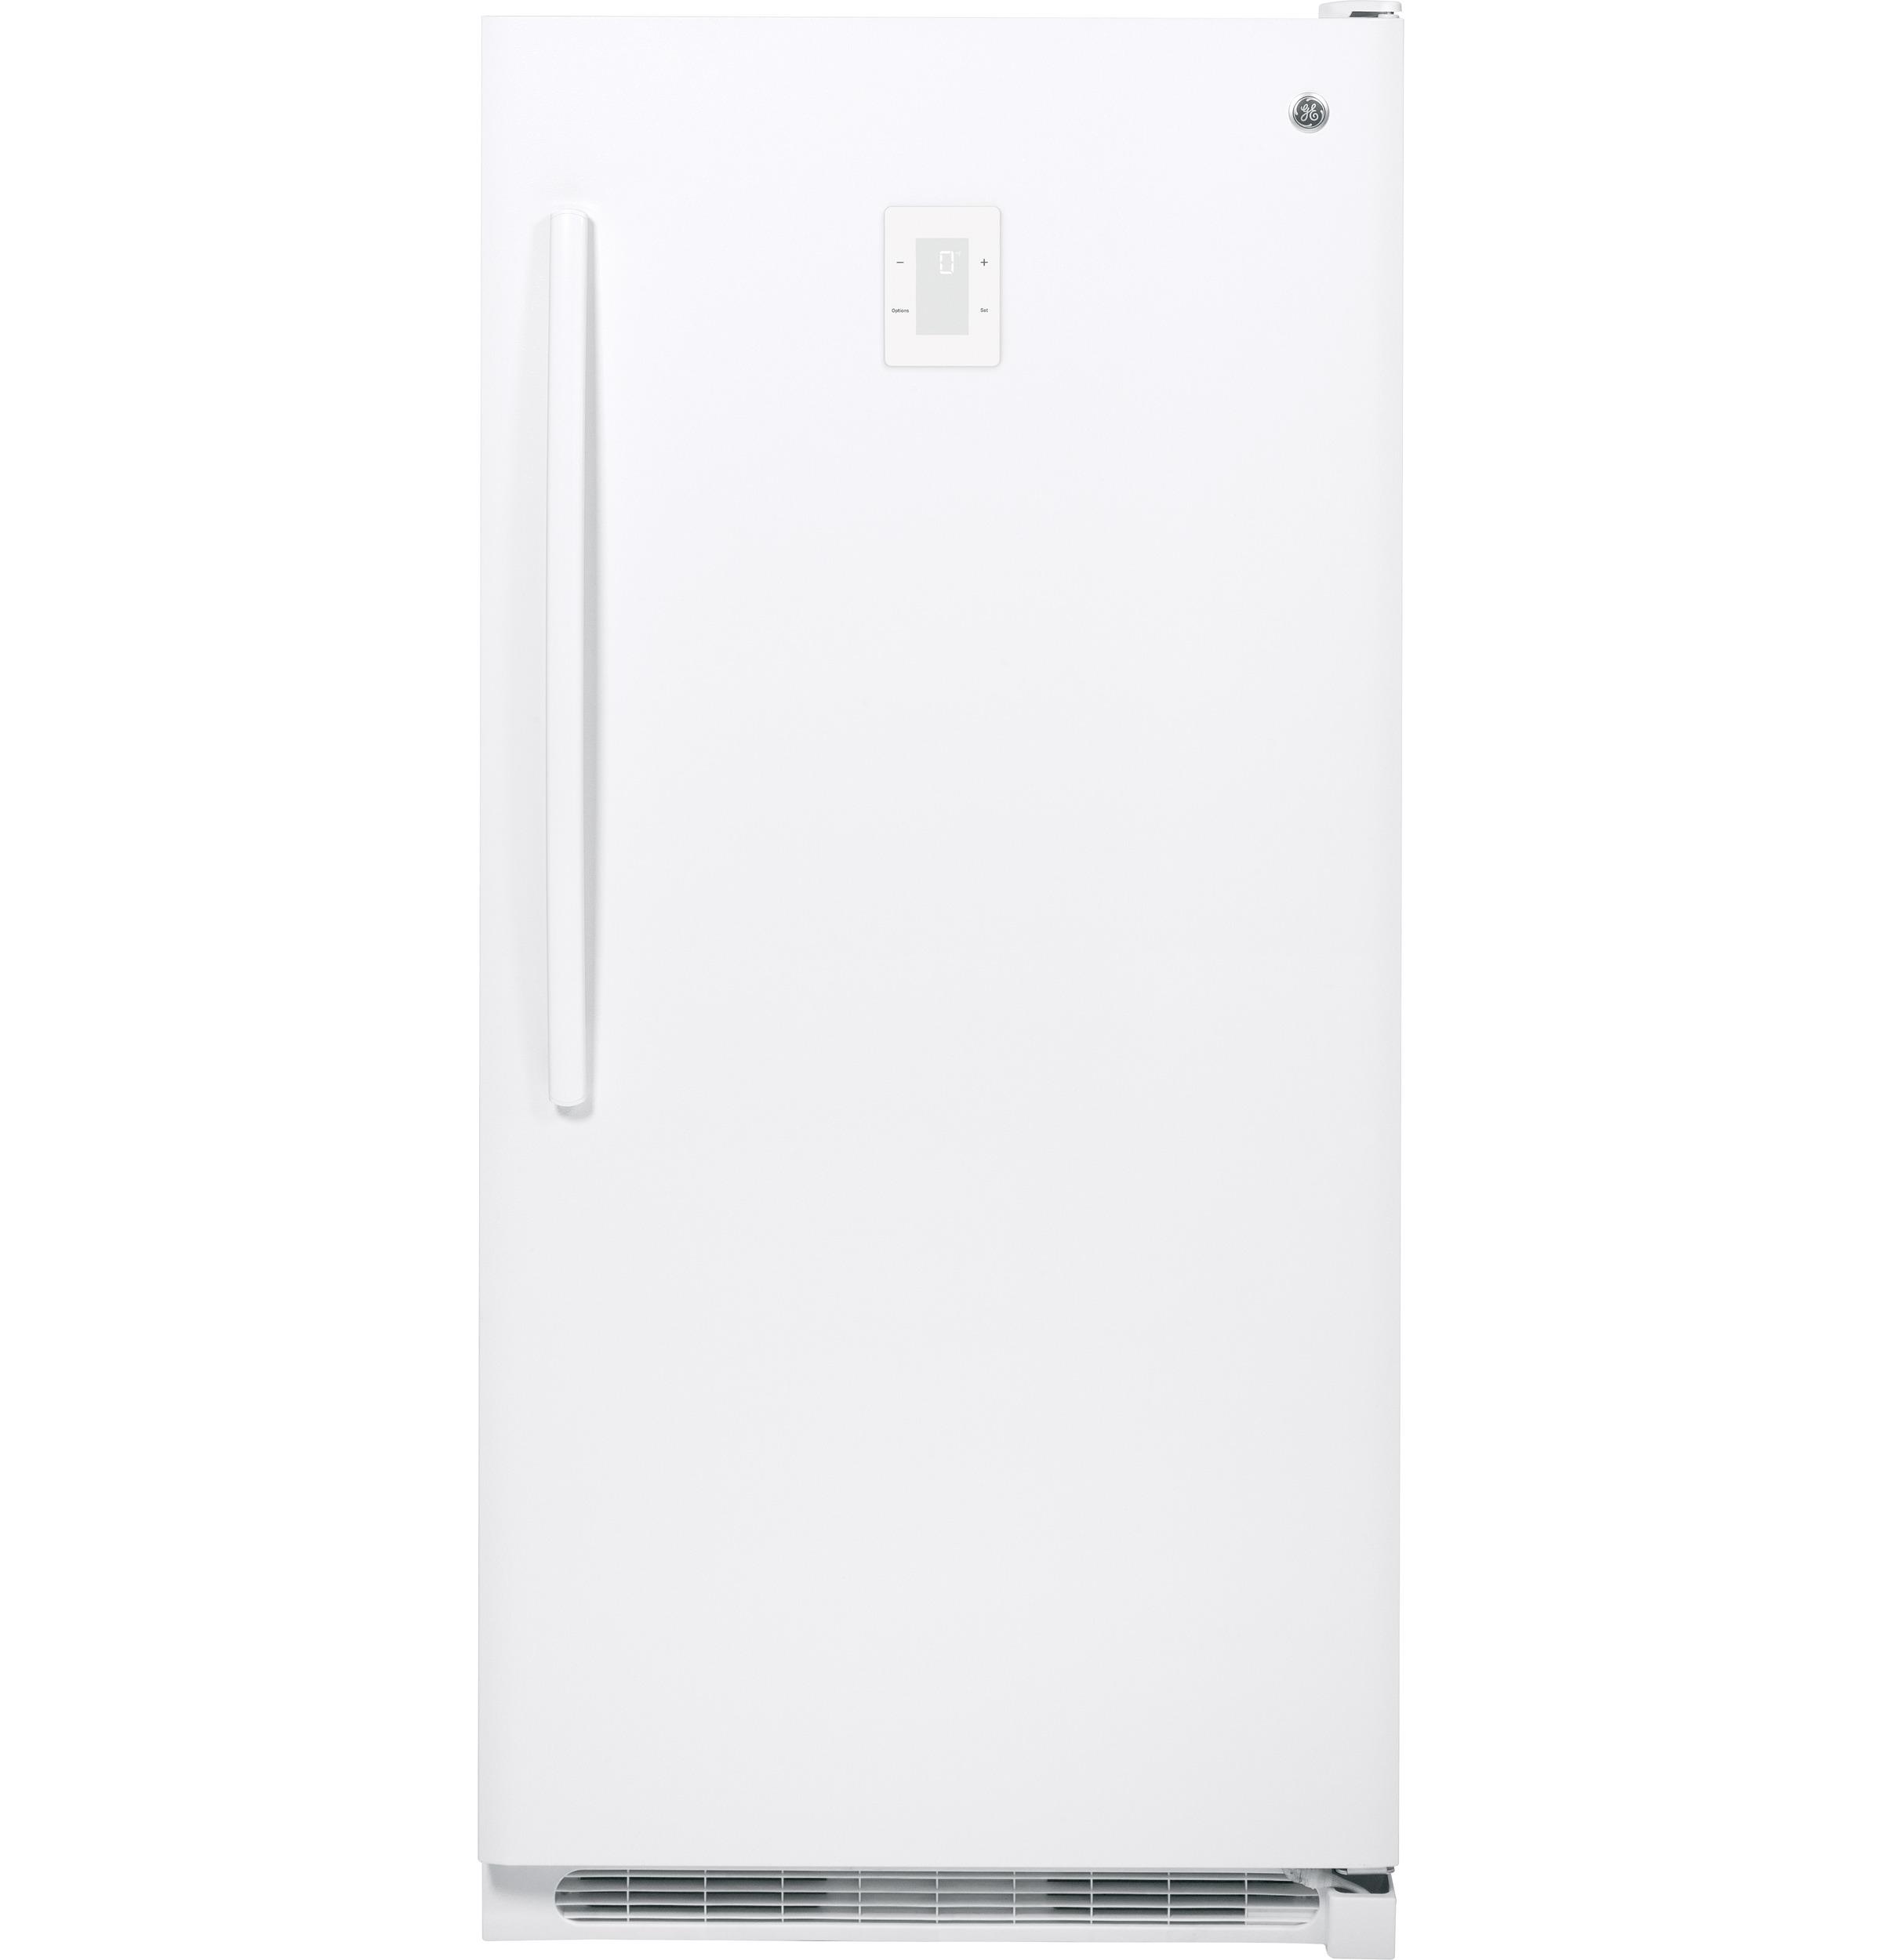 GE 美國奇異 FUF20DHRWW 583L自動除霜立式冰櫃 全新公司貨